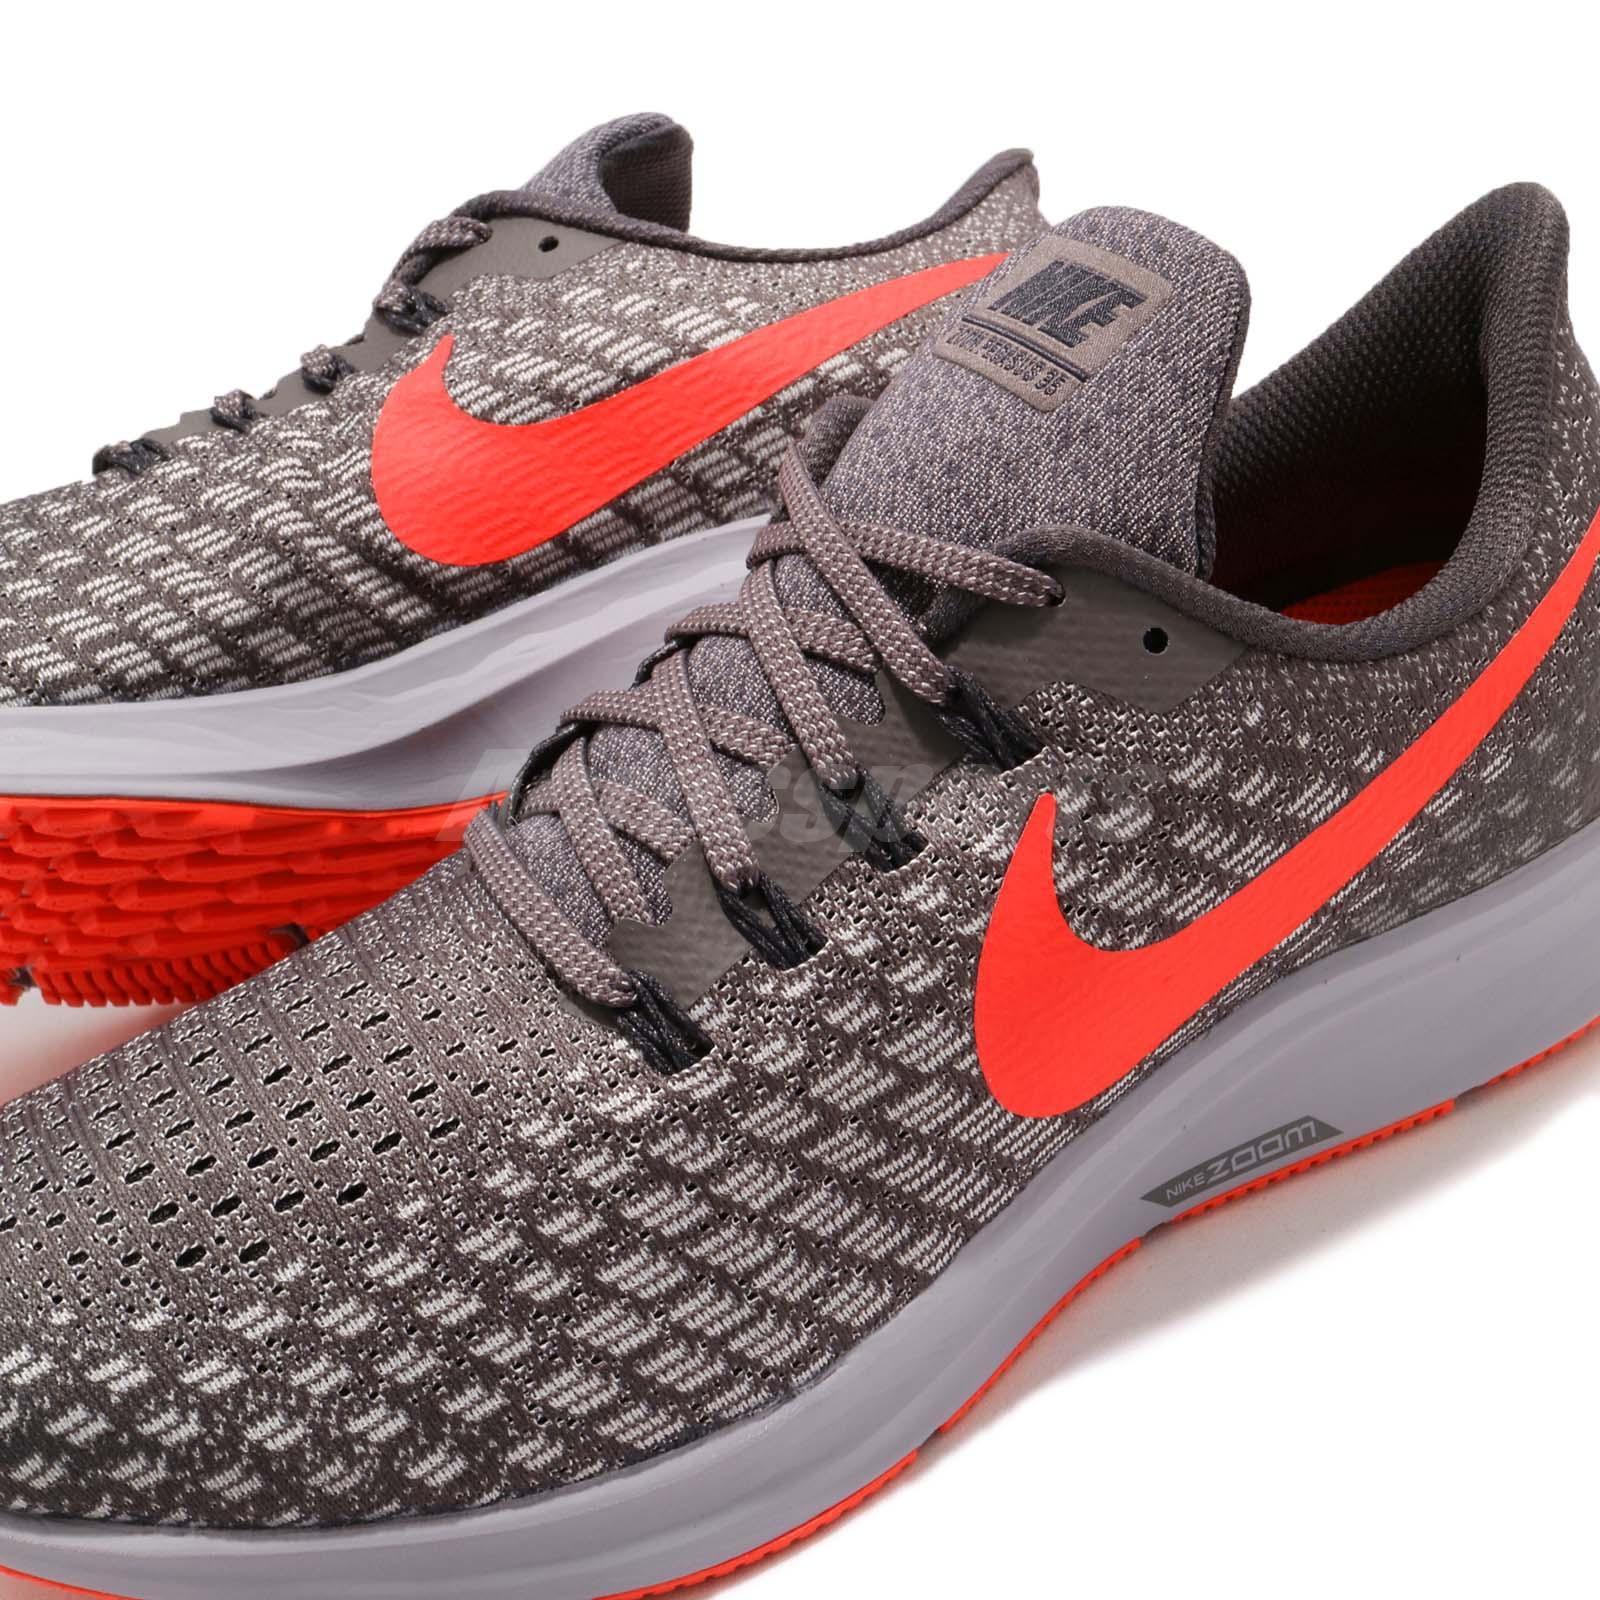 official photos 7d6b7 285d1 Details about Nike Air Zoom Pegasus 35 Thunder Grey Bright Crimson Men  Running Shoe 942851-006